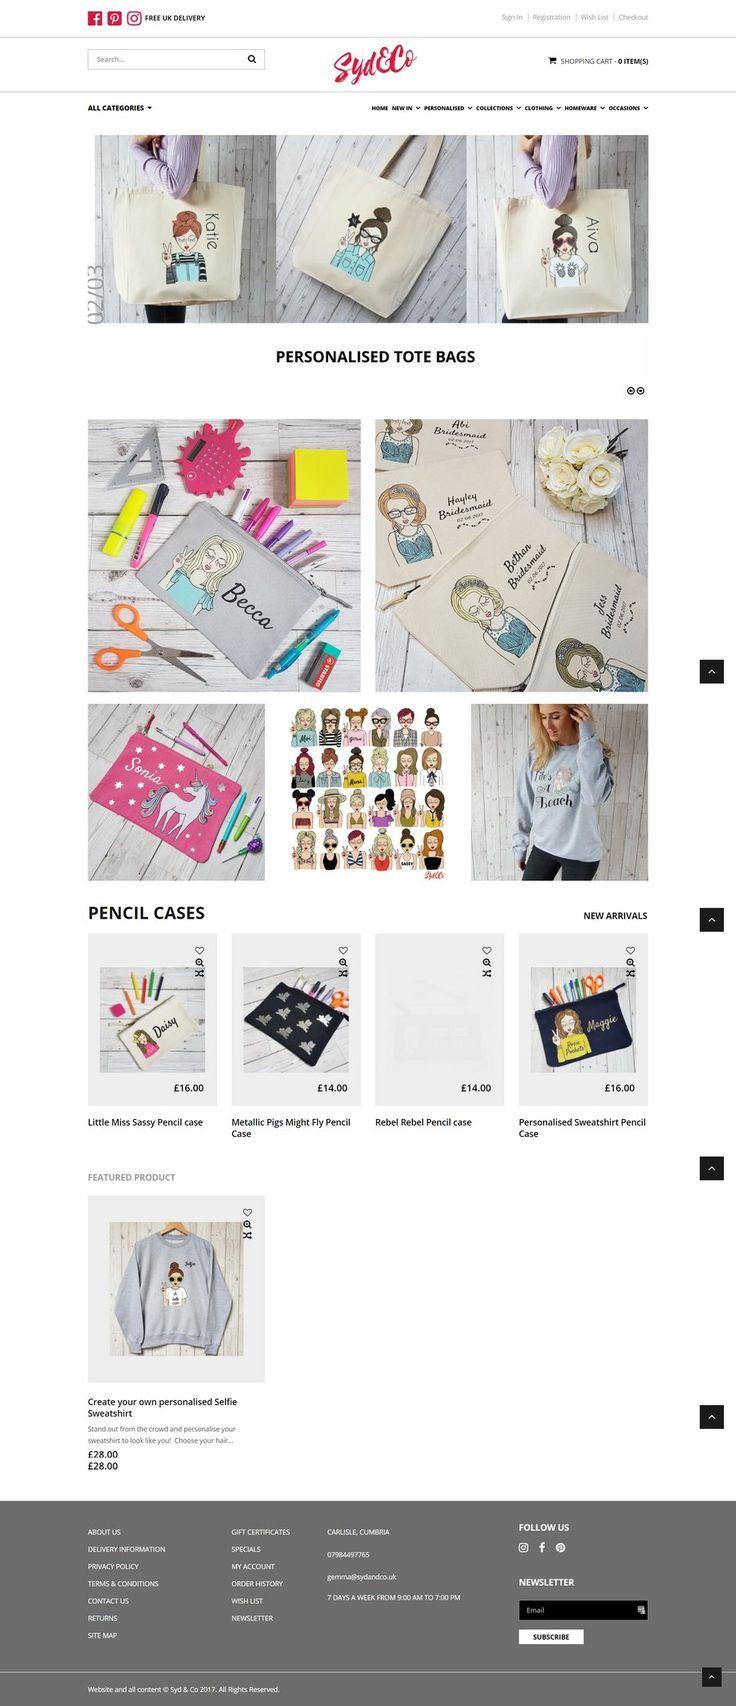 A fully comprehensive e-commerce website design for Syd & Co in Carlisle, Cumbria